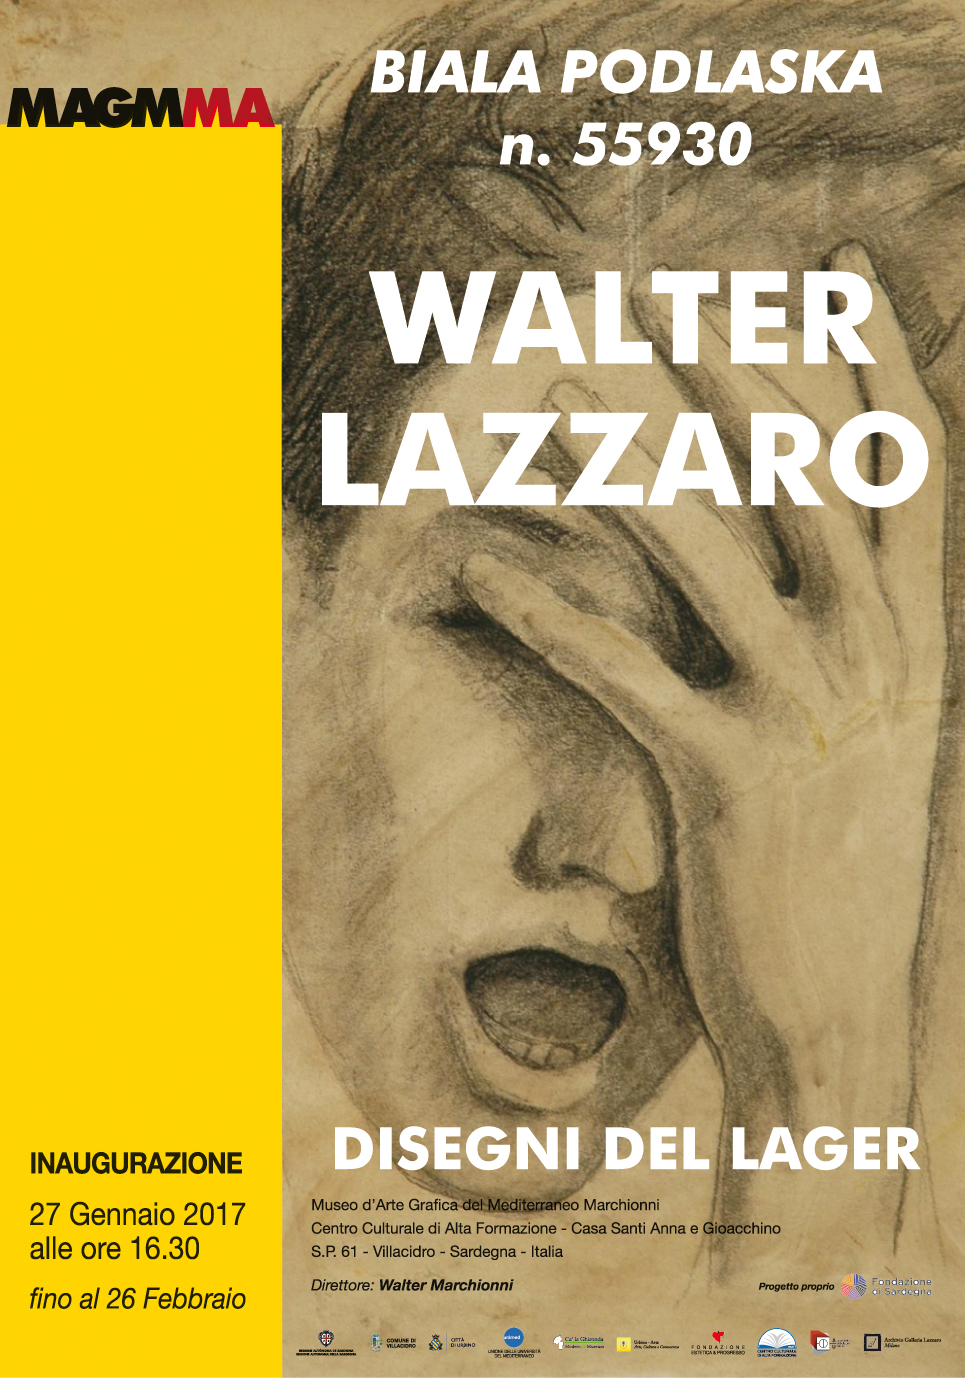 Biala Podlaska n. 55930 – Walter Lazzaro  Disegni del Lager